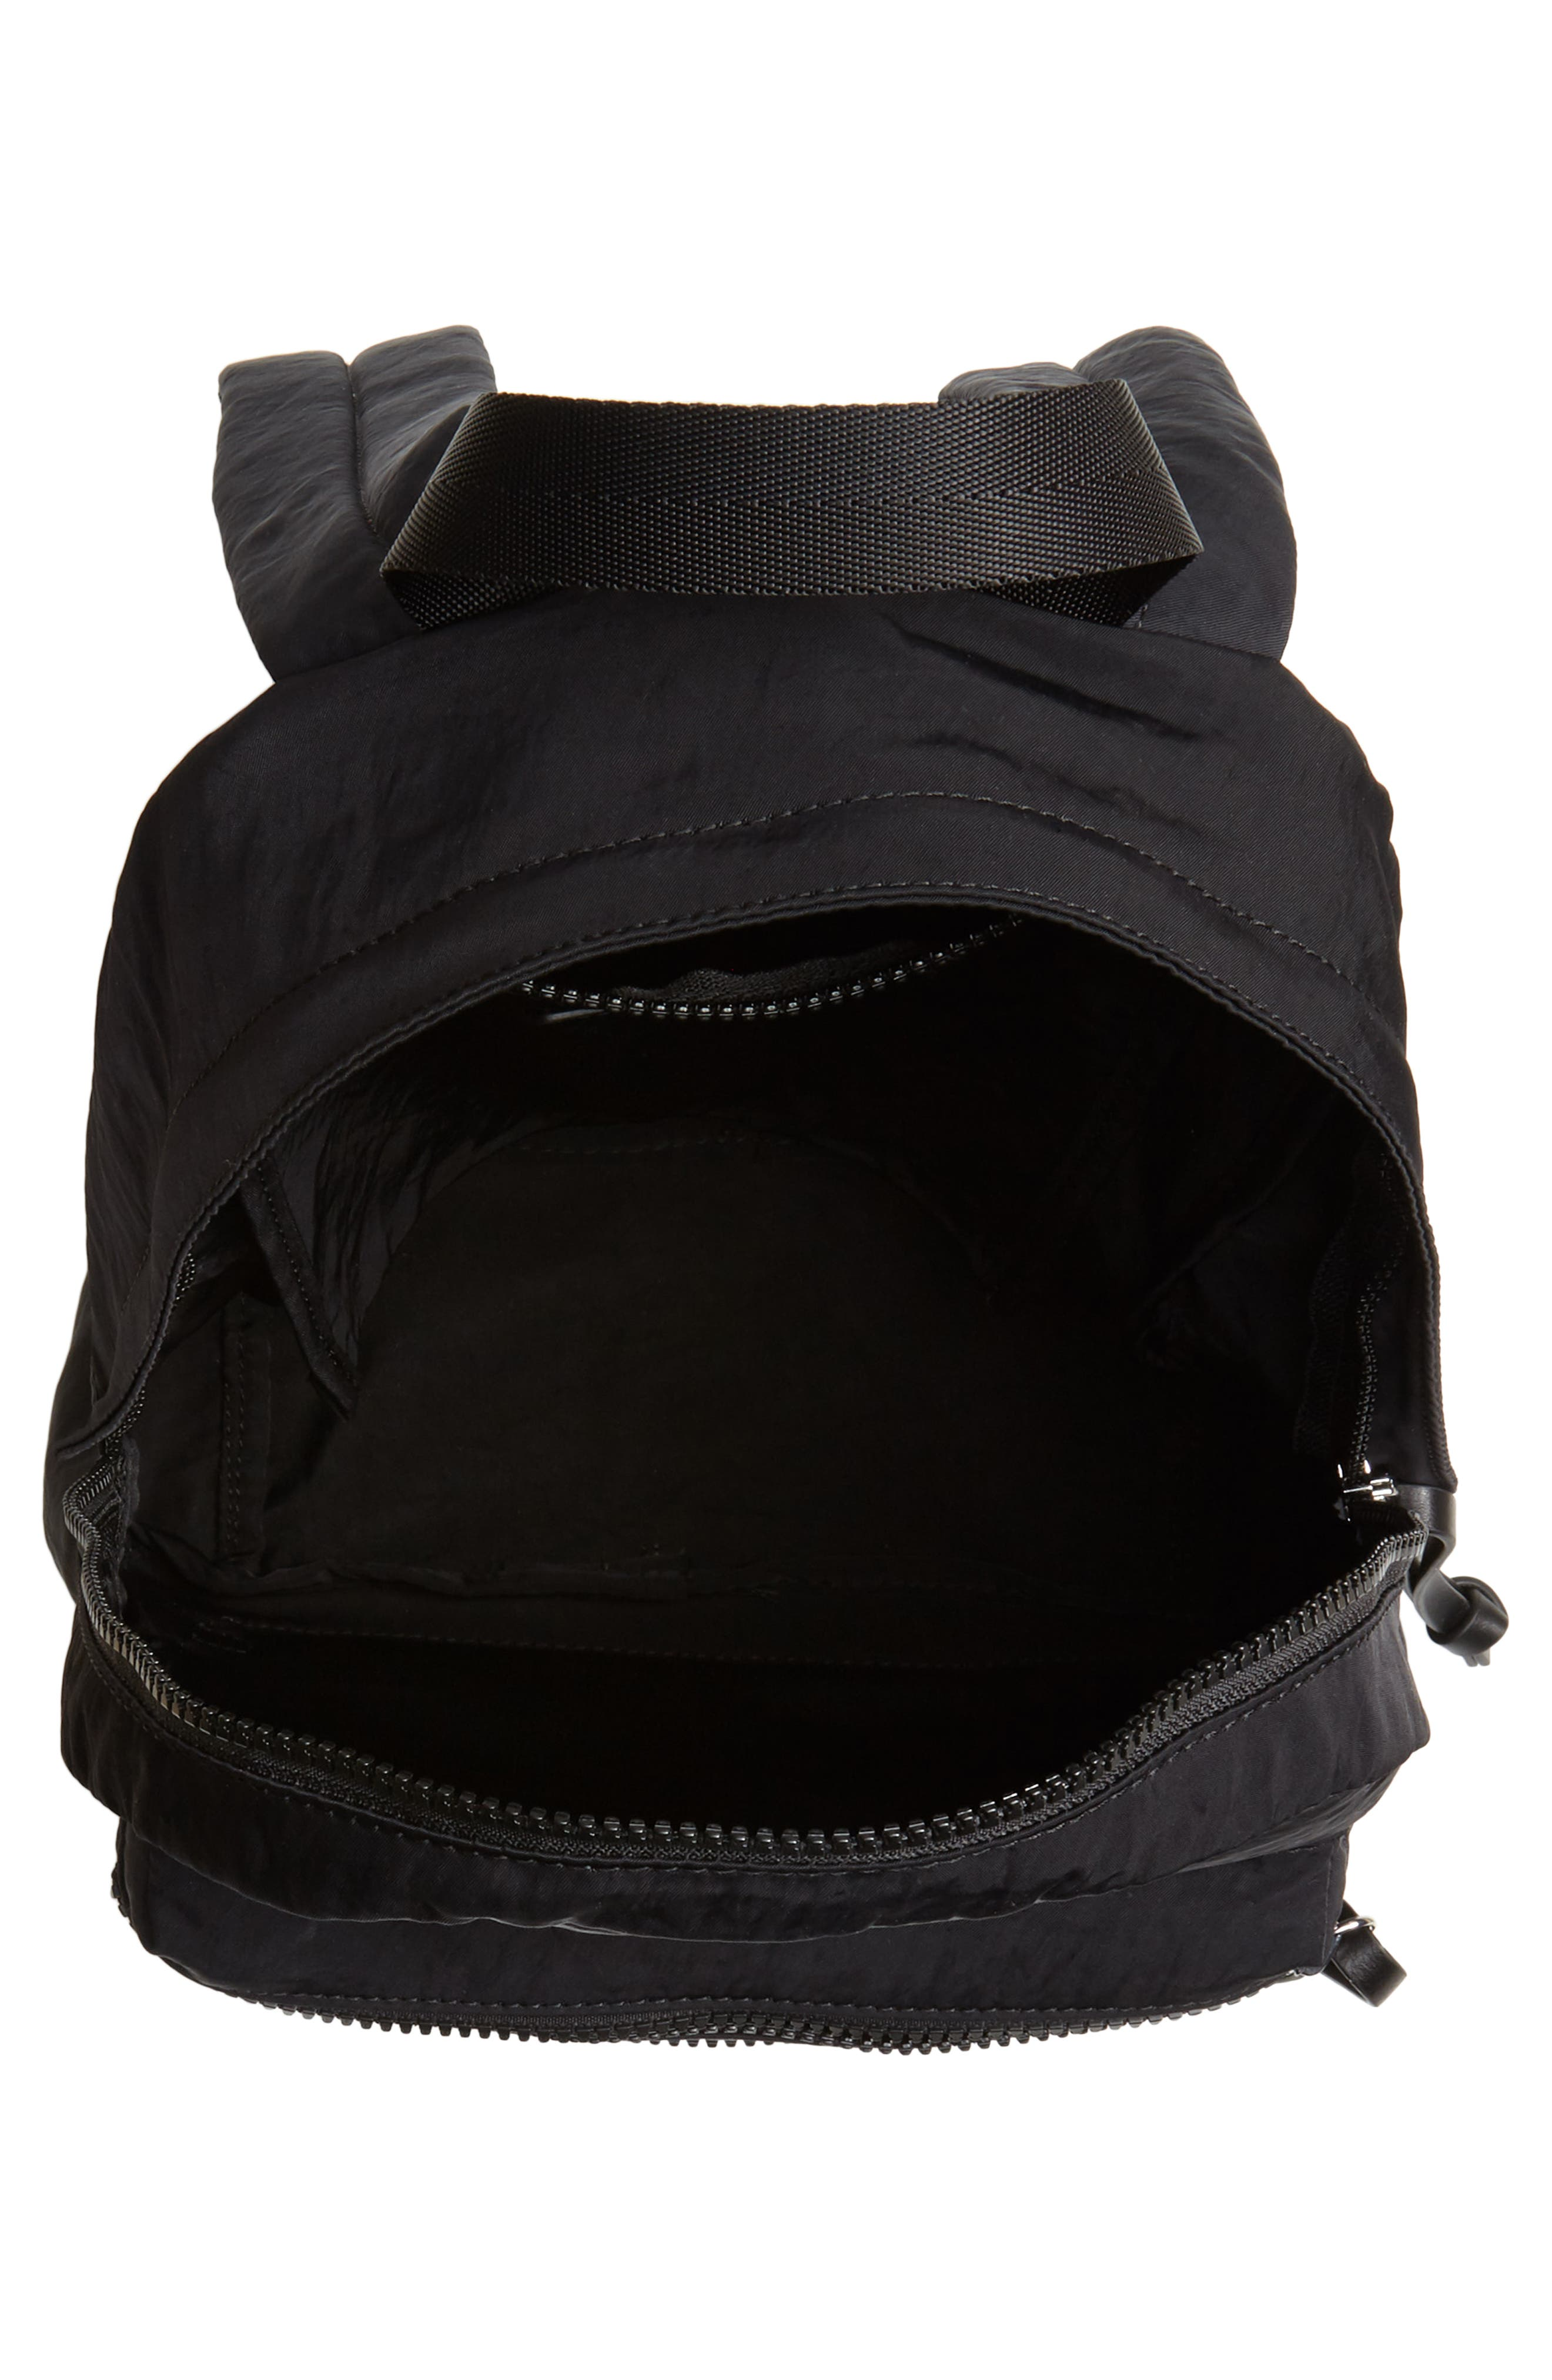 REBECCA MINKOFF, Nylon Backpack, Alternate thumbnail 5, color, BLACK